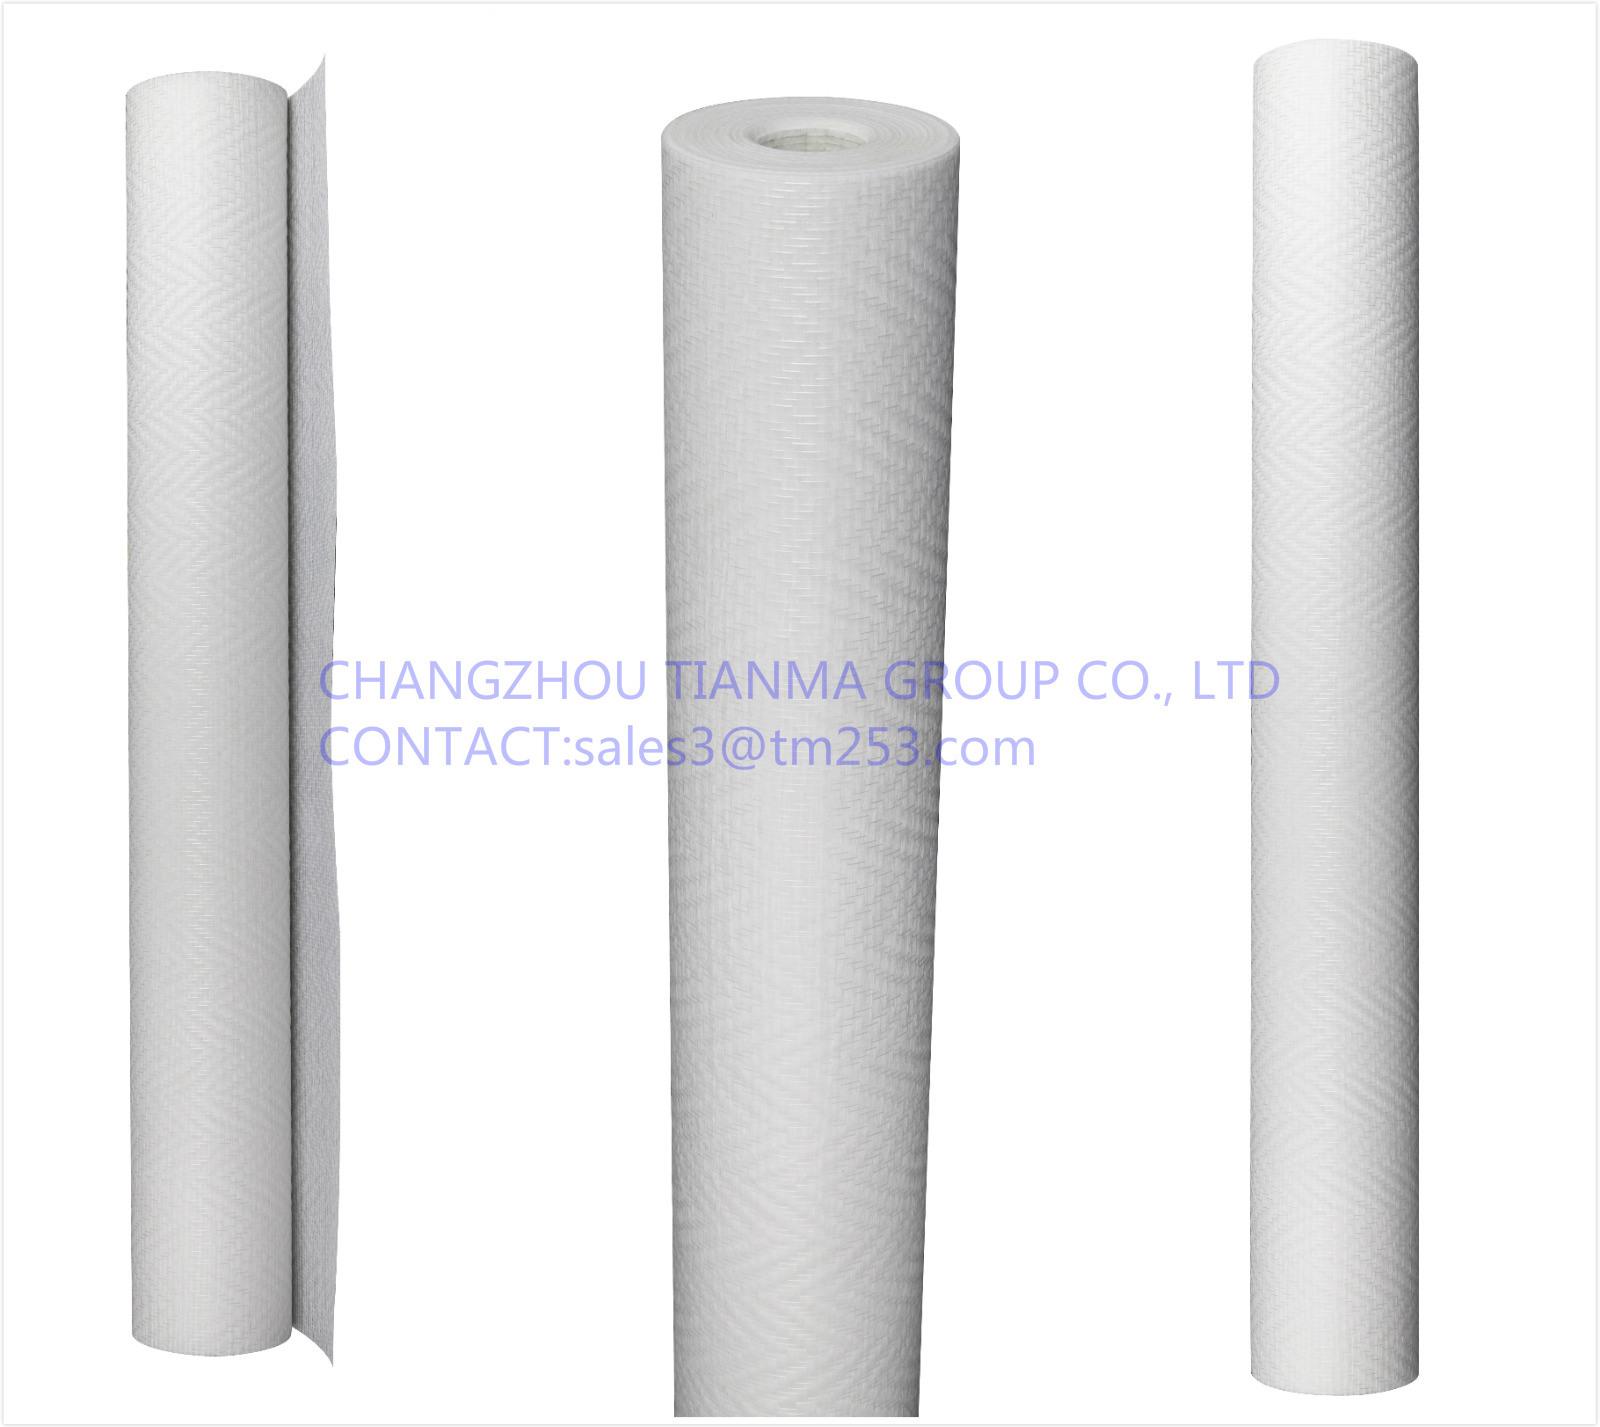 High Quality Fiberglass Wallcovering Paper H0104